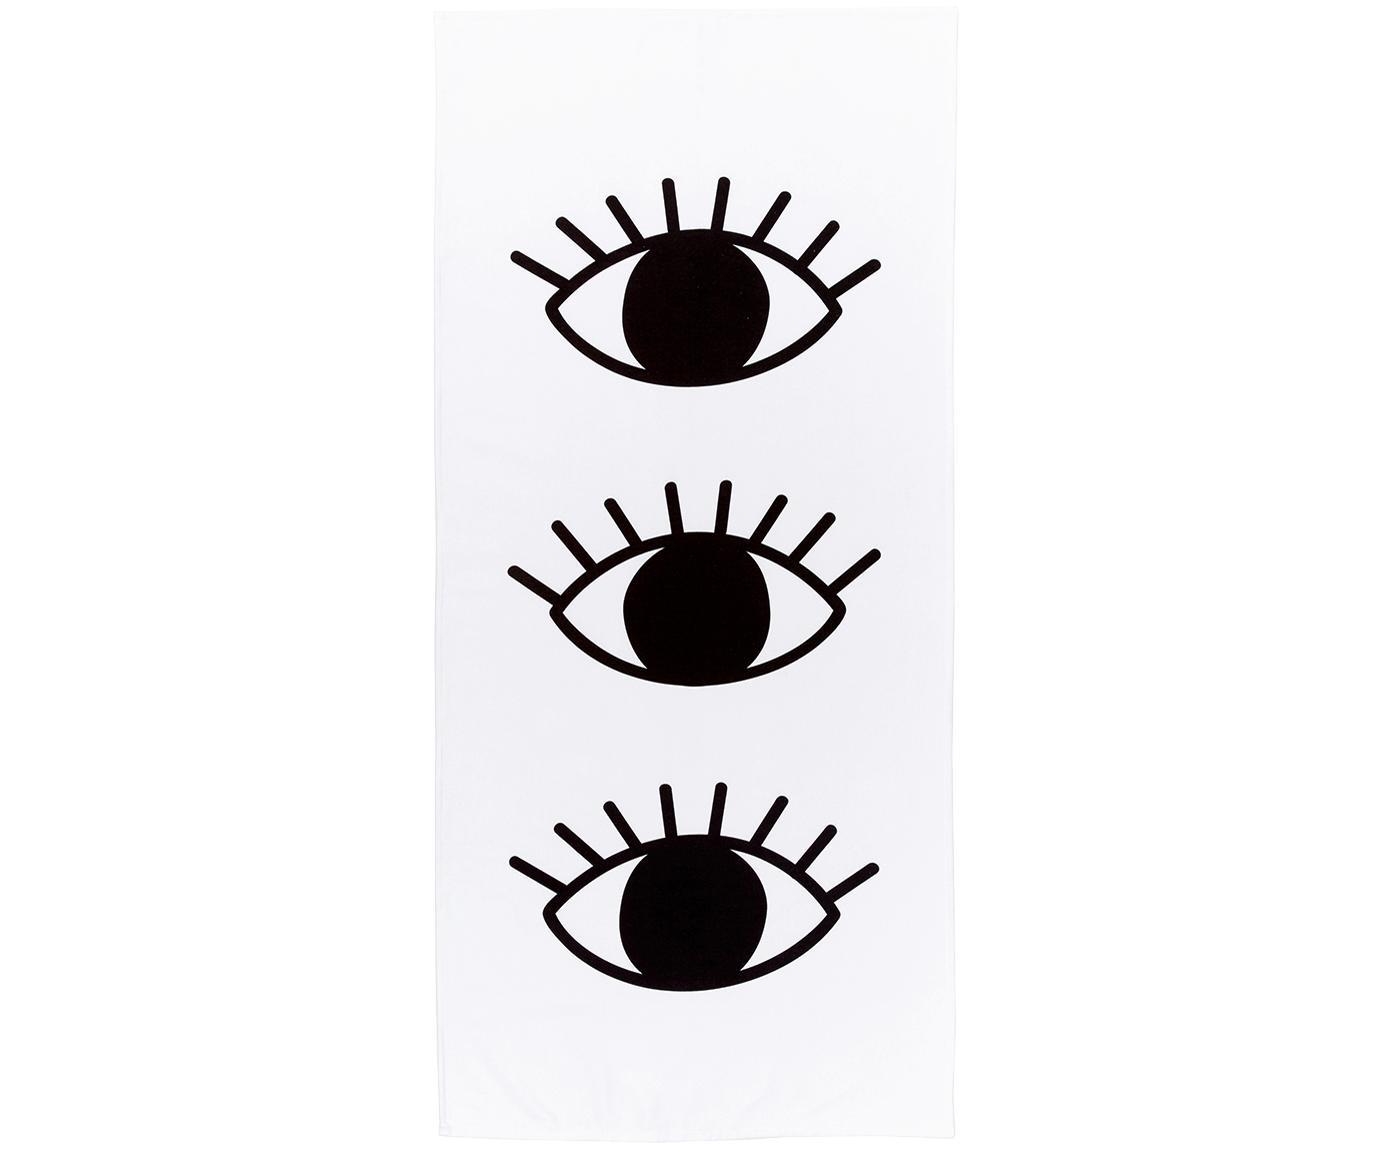 Toalla de playa ligera Eyes, 55%poliéster, 45%algodón Gramaje ligero 340g/m², Blanco, negro, An 70 x L 150 cm